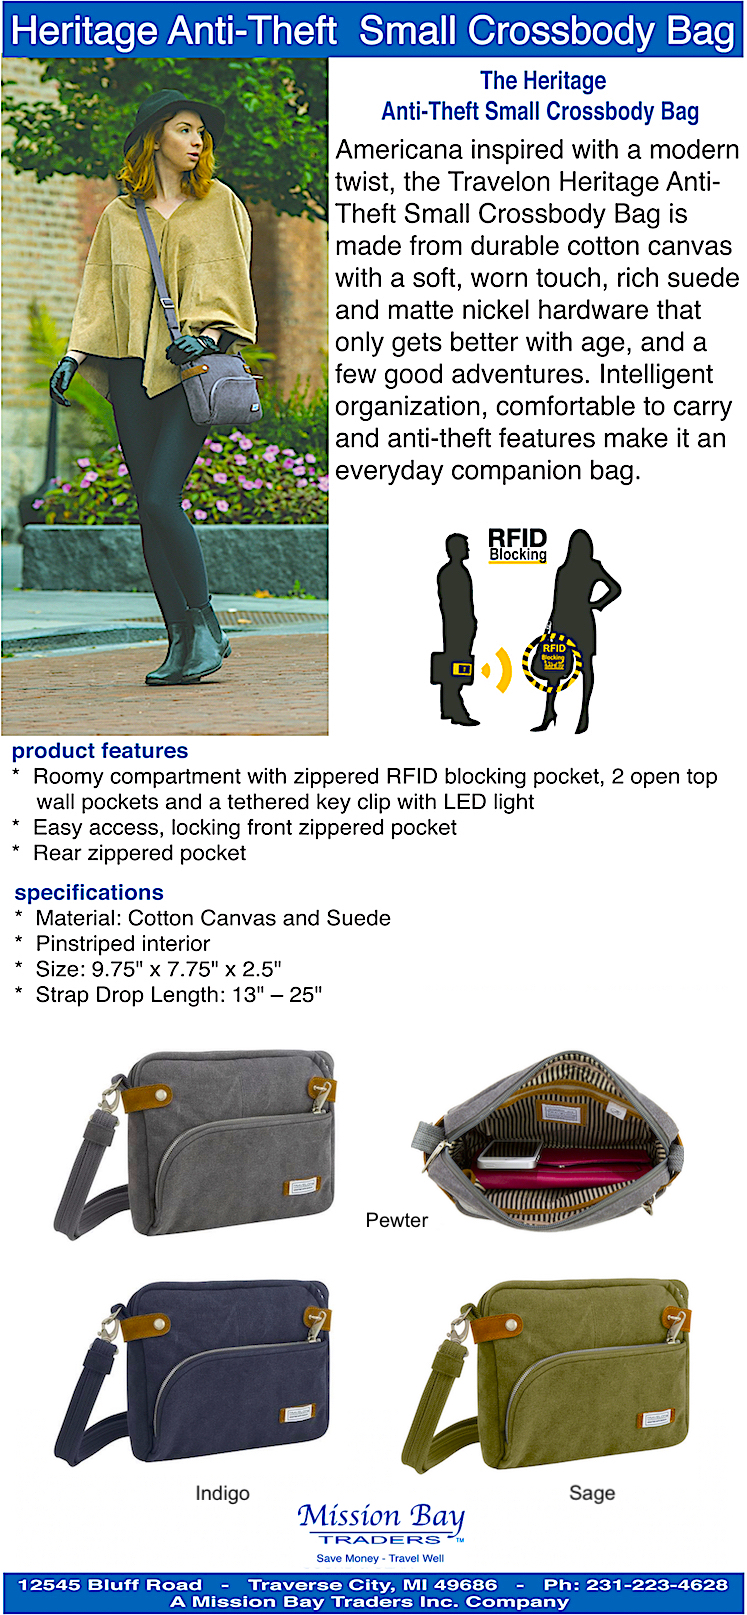 Travelon Anti Theft Heritage Crossbody Bag   Travelon bags